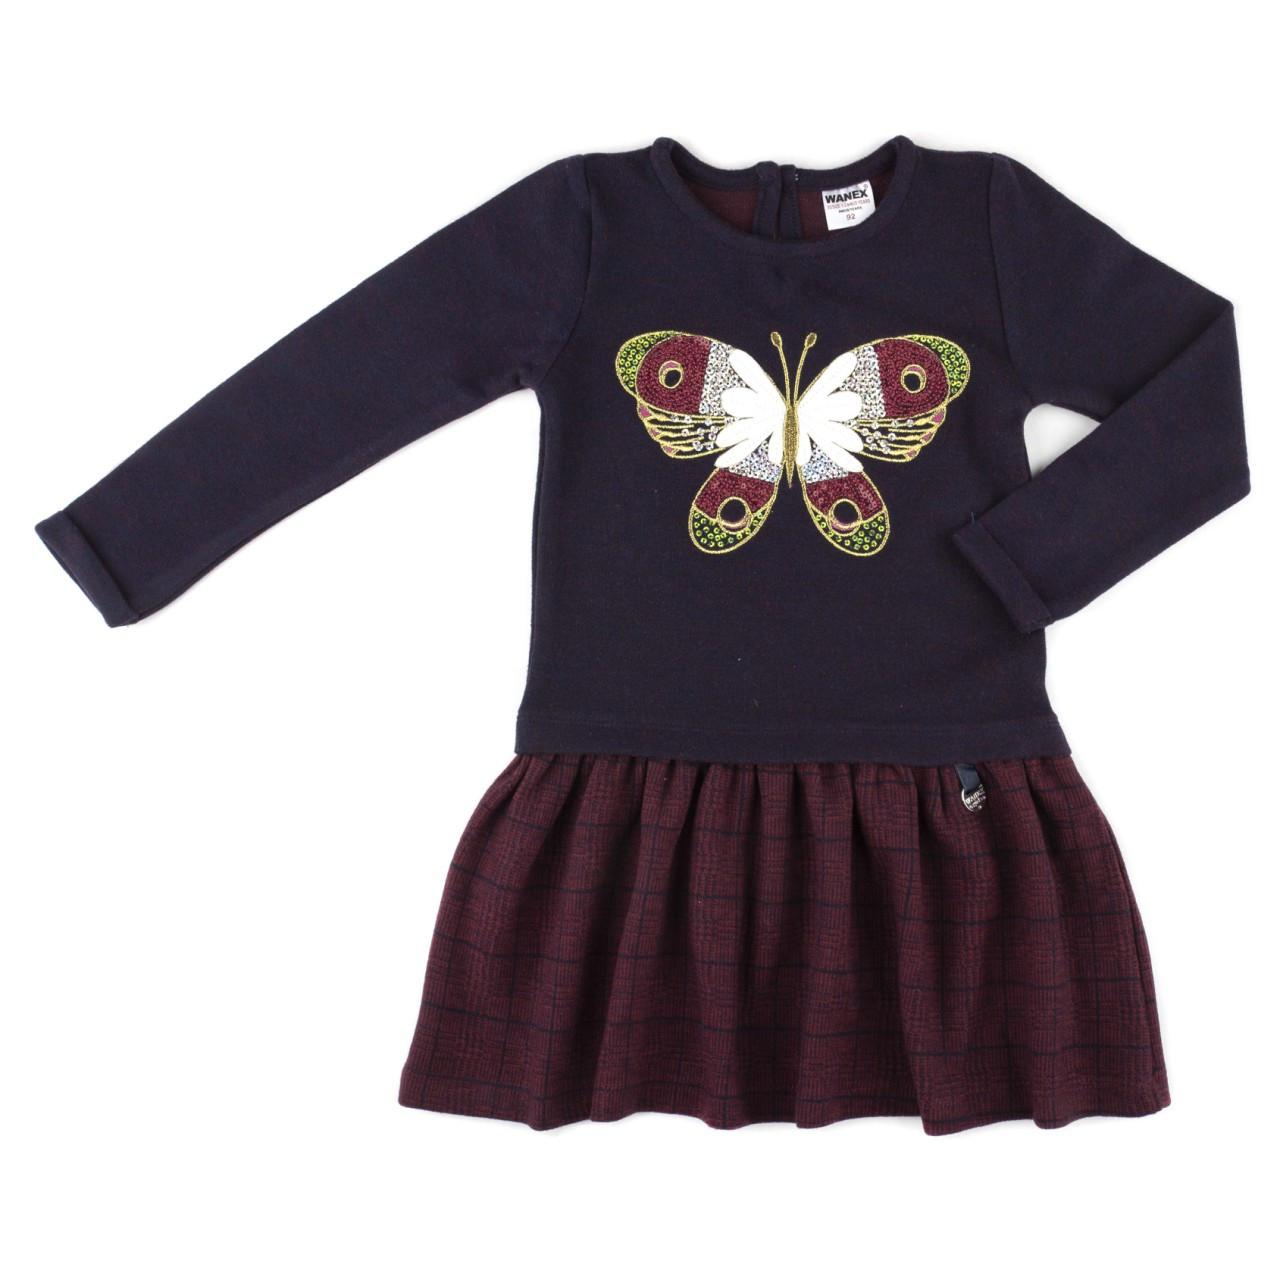 185633e07c1 Платье WANEX с бабочкой 92 98 104 116 122